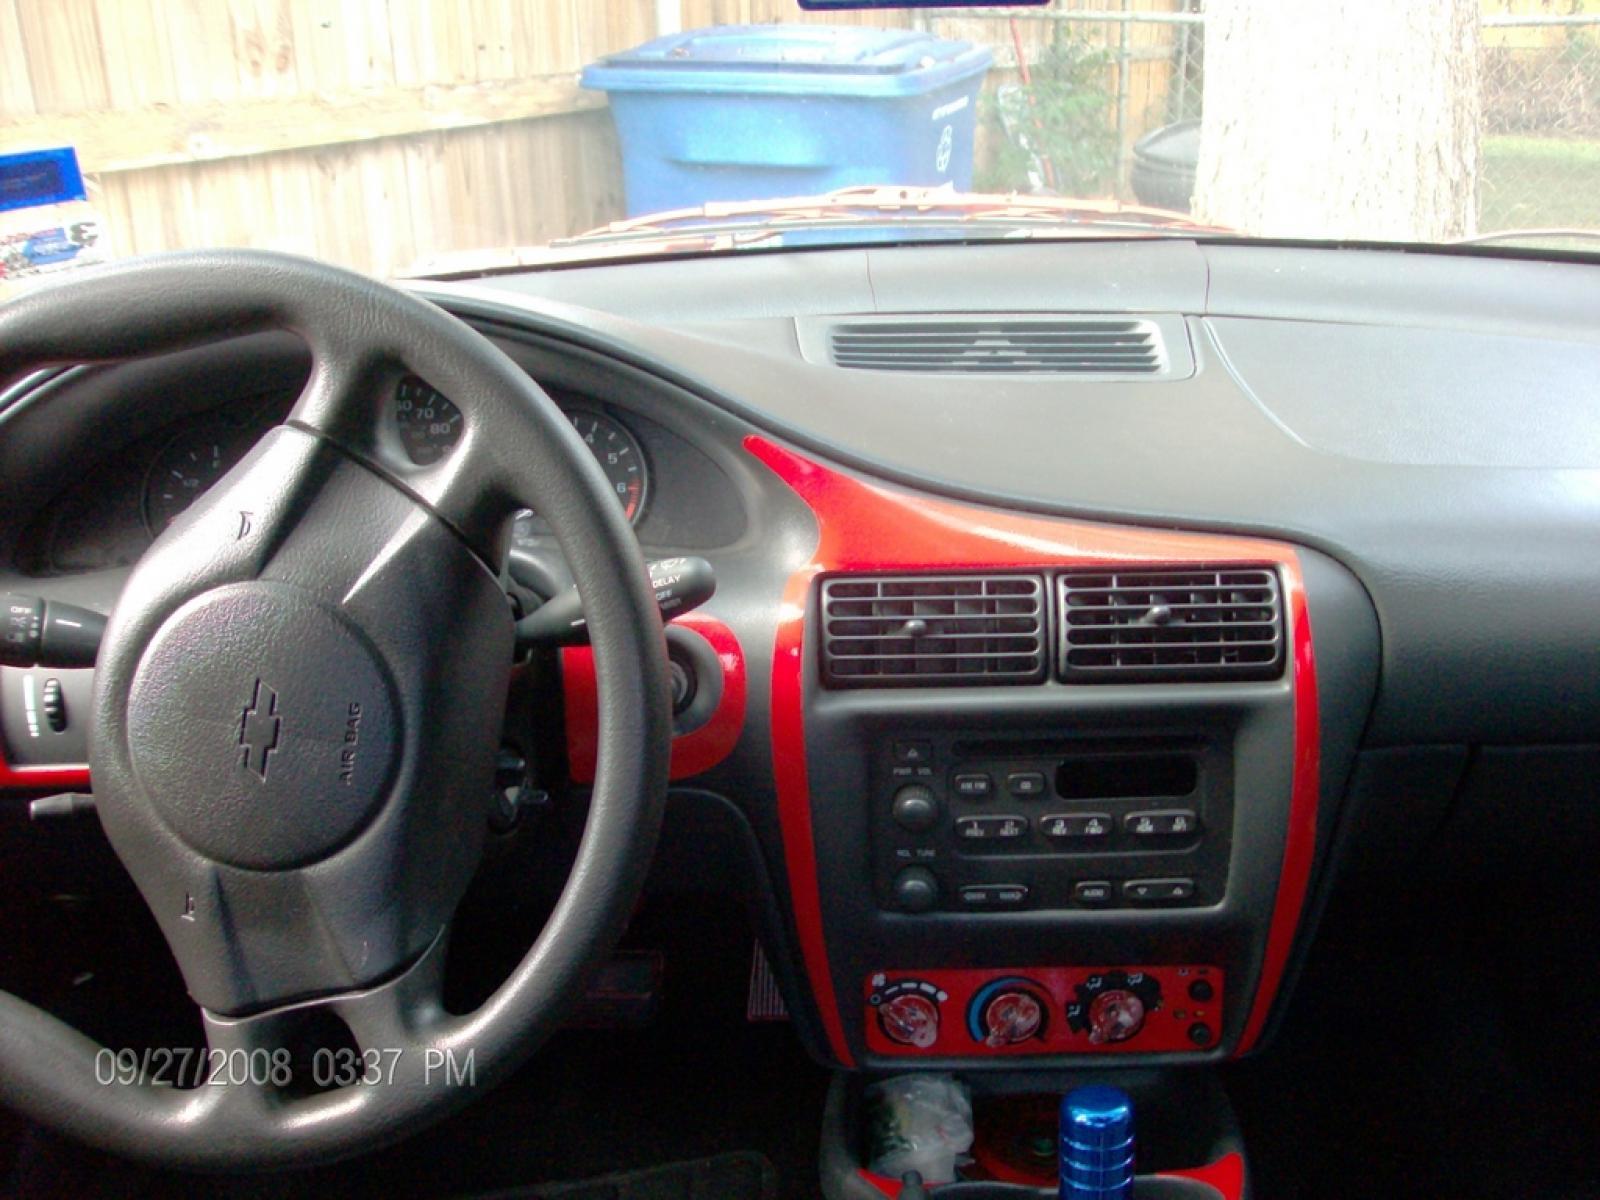 800 1024 1280 1600 origin 2004 Chevrolet Cavalier ...